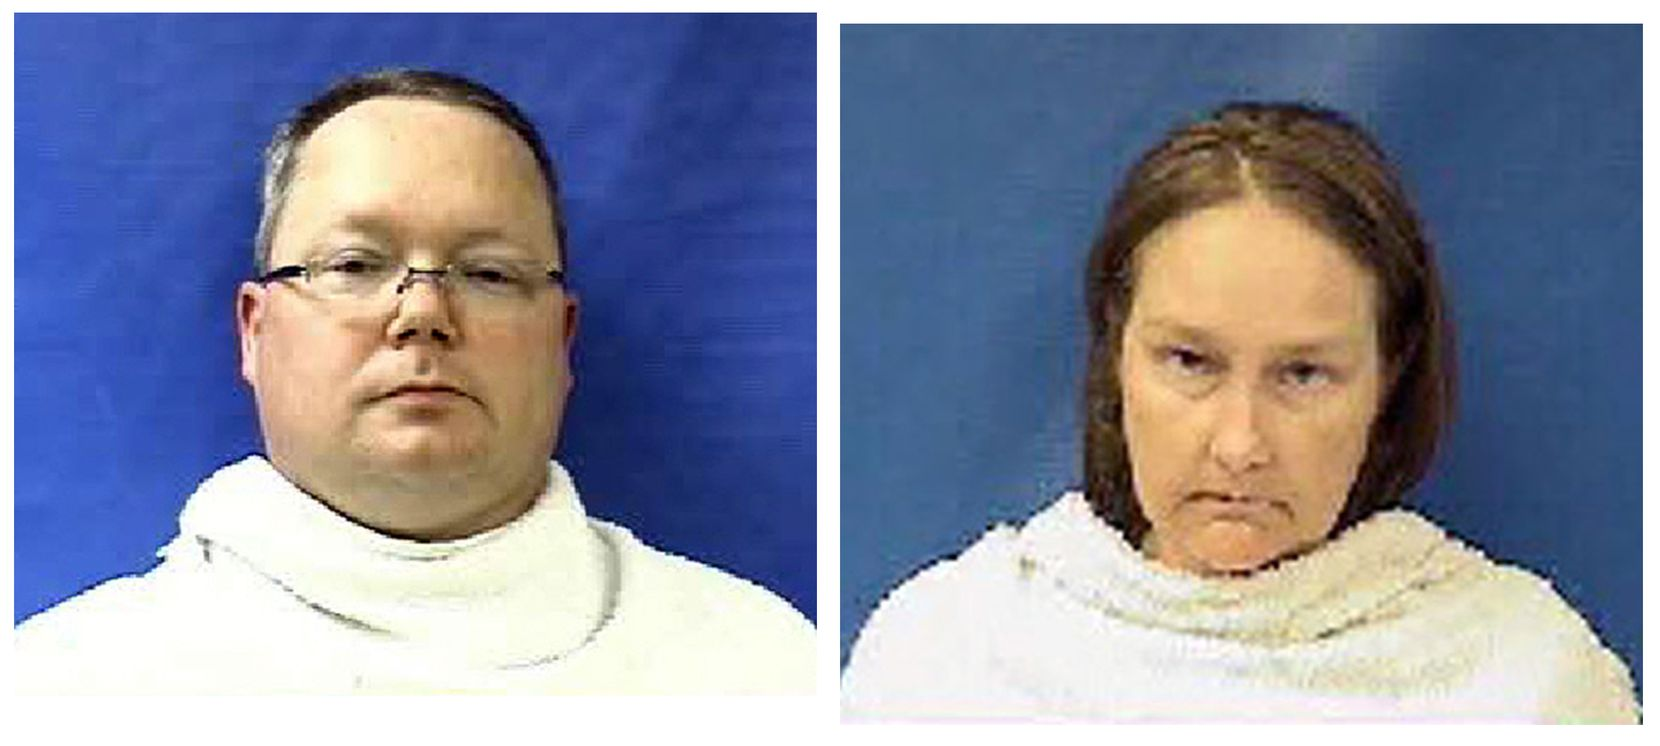 Eric and Kim Williams (Kaufman County Sheriff's Office)